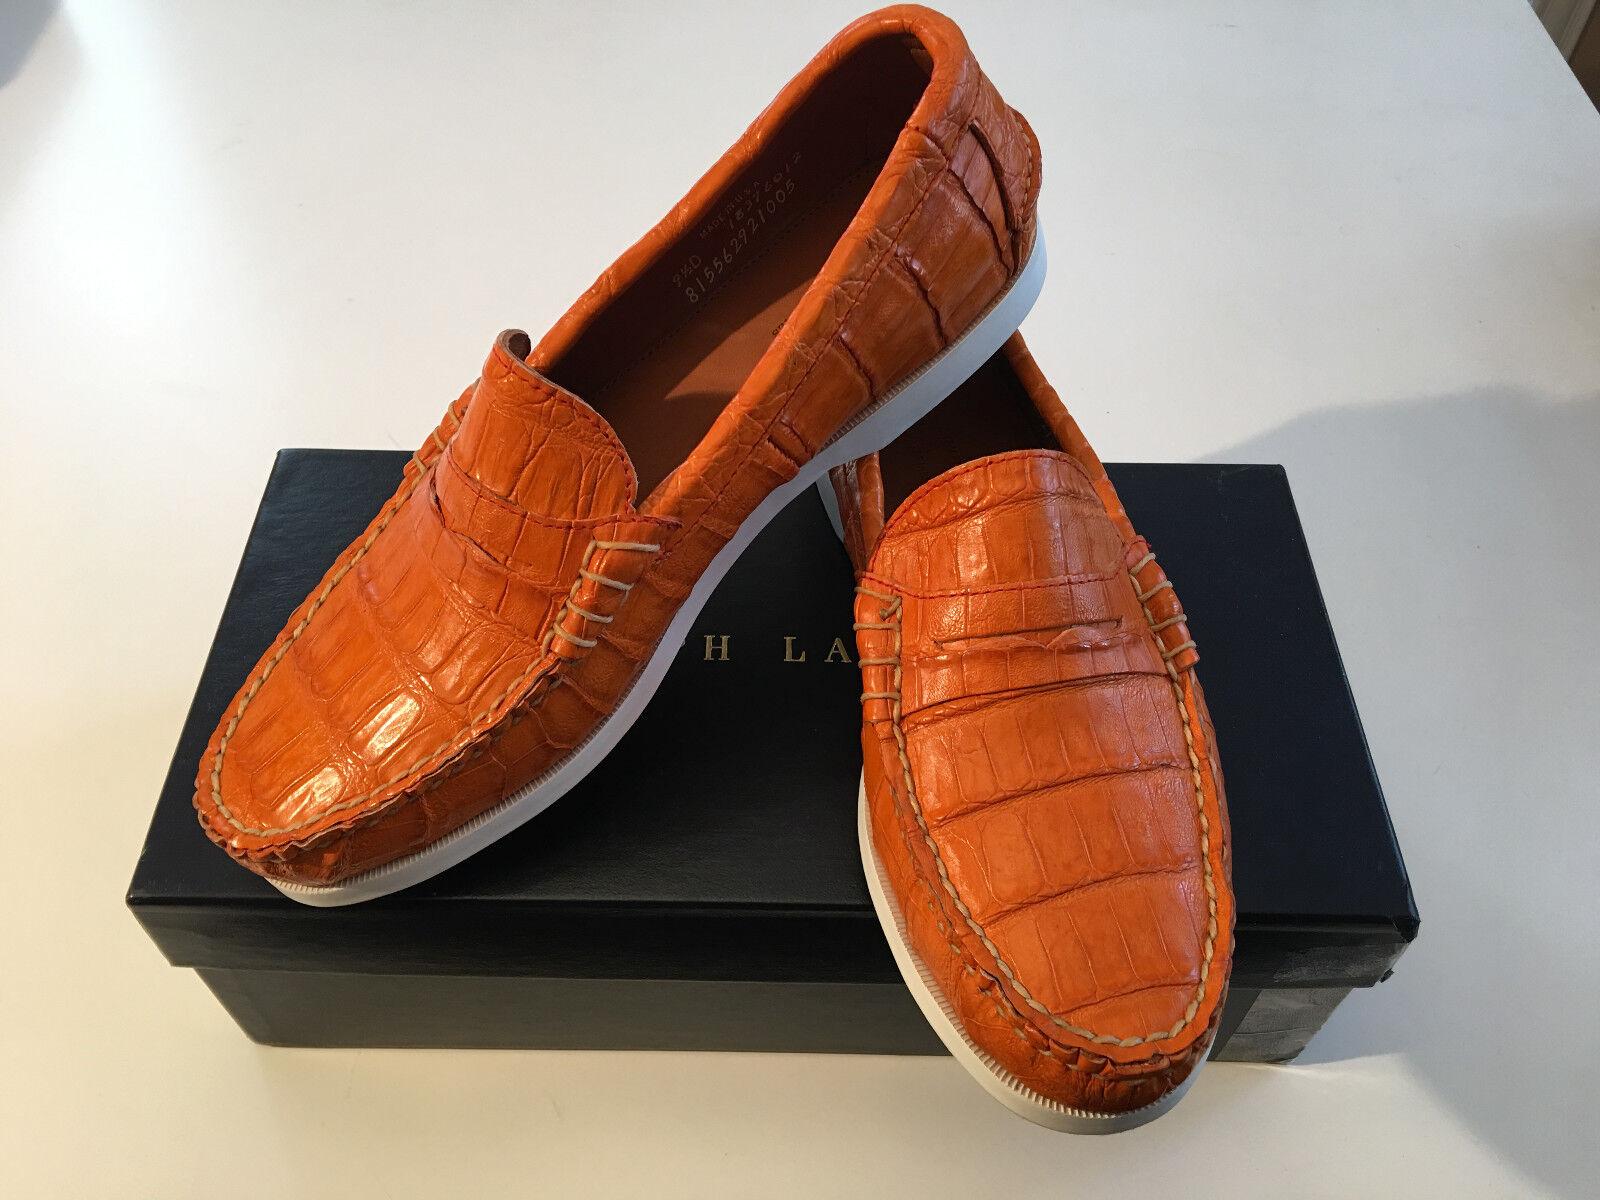 NIB RALPH LAUREN Collection Orange Boat Crocodile TAMWORTH Boat Orange Loafers Shoes 9.5D 516a20